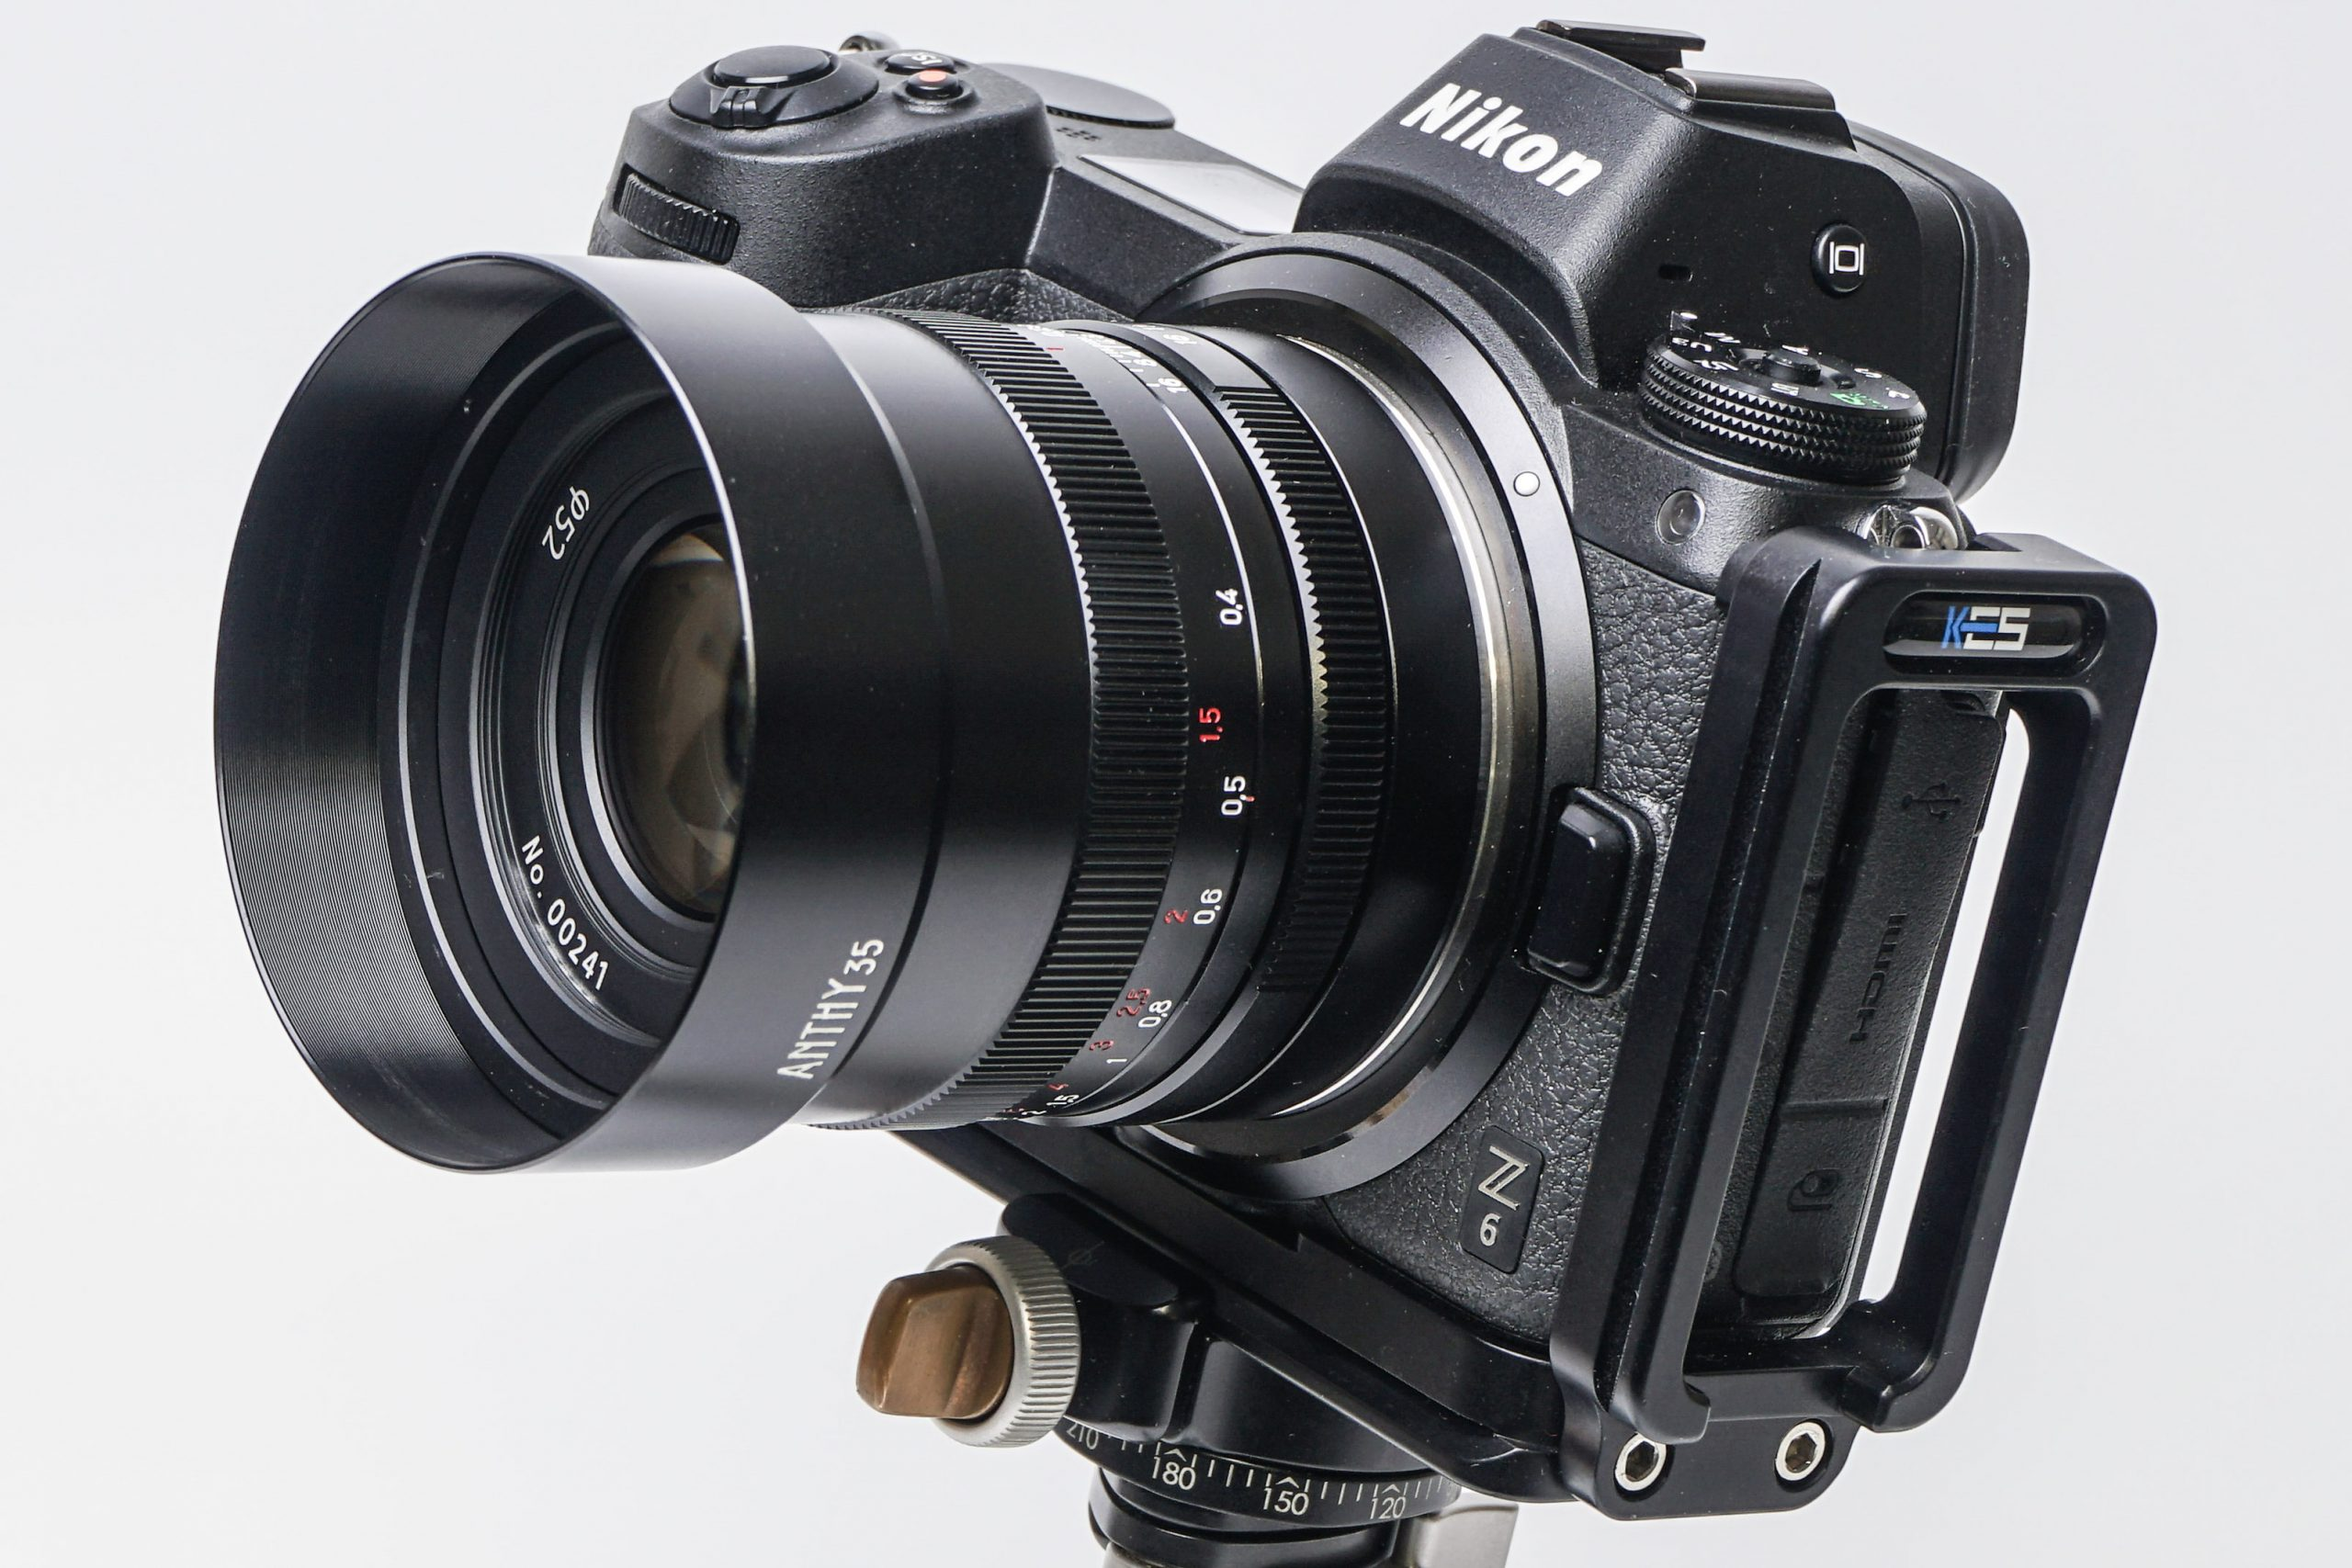 Nikon Z ANTHY35 Z6 ニコン用 ニコン 作例 レビュー